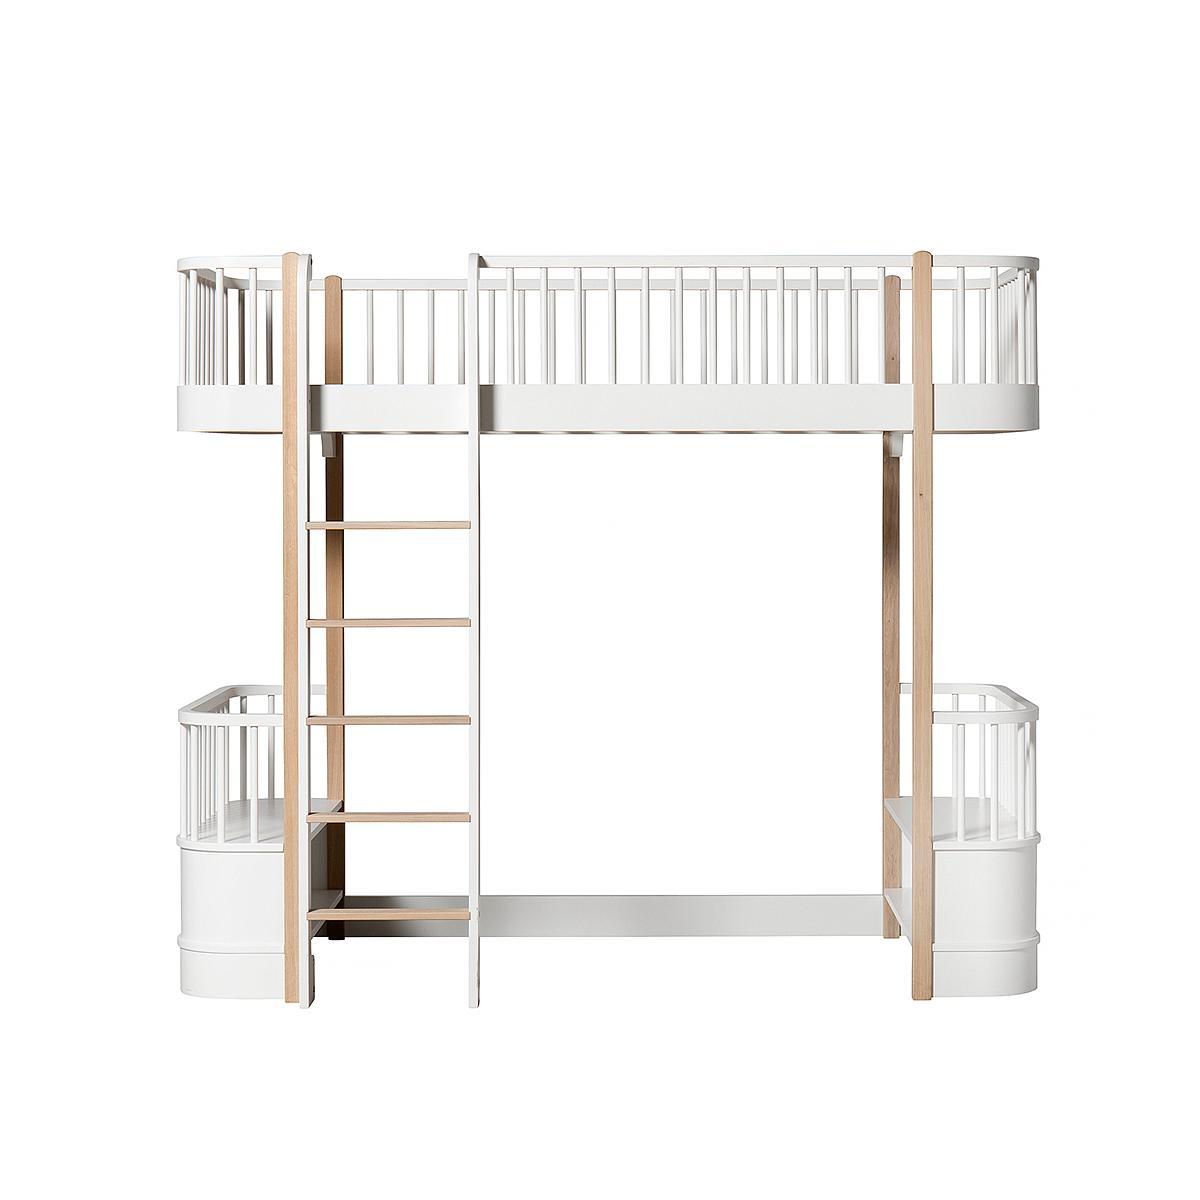 Lit évolutif mezzanine 90x200cm WOOD ORIGINAL Oliver Furniture blanc-chêne